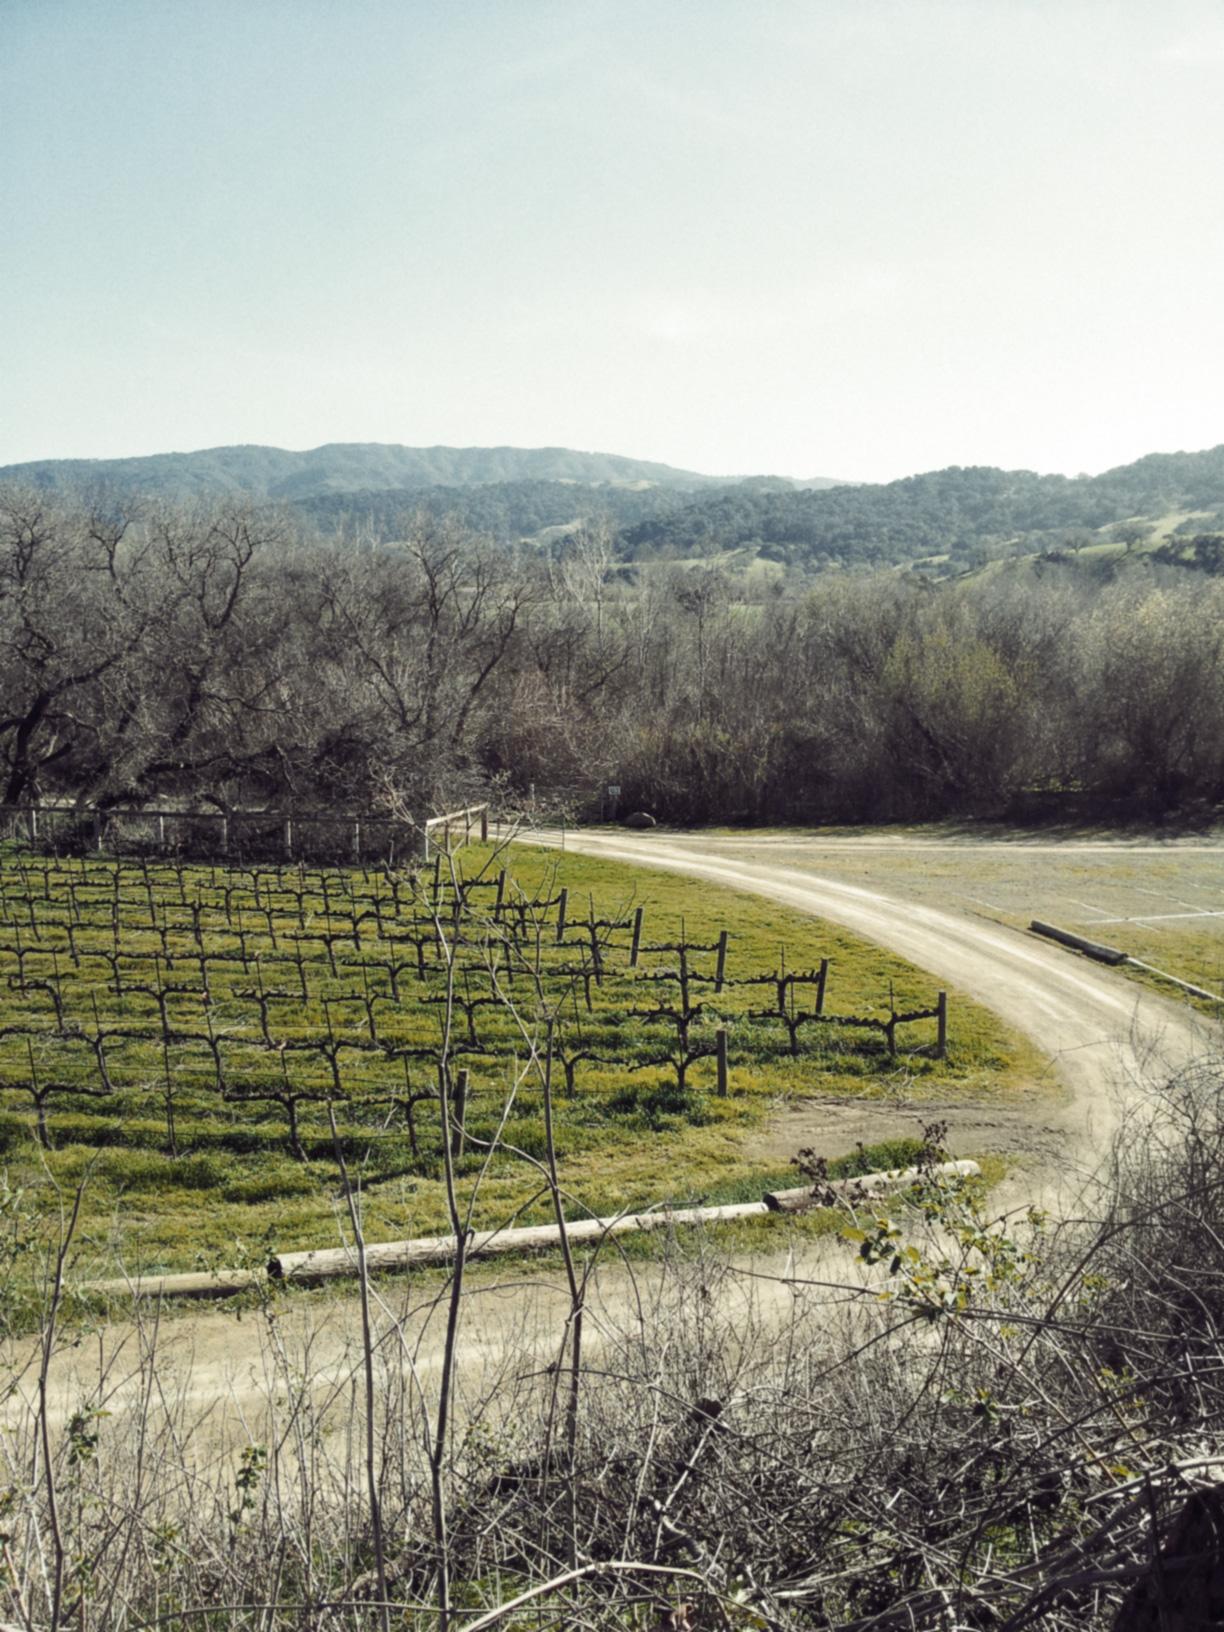 Winery_View.jpg